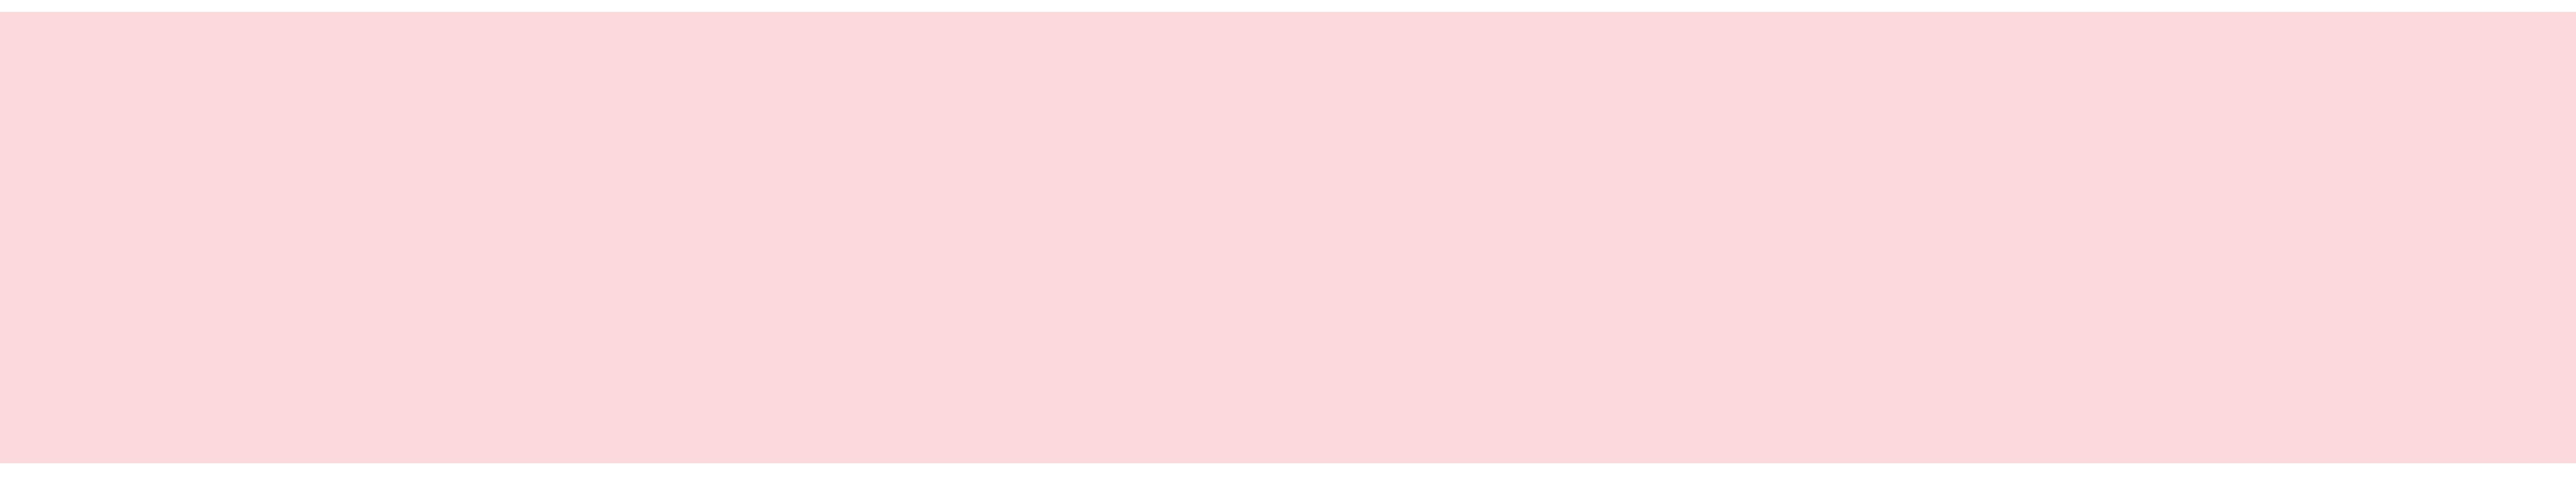 svg free download Lace clipart clip art. Pink decoration png image.